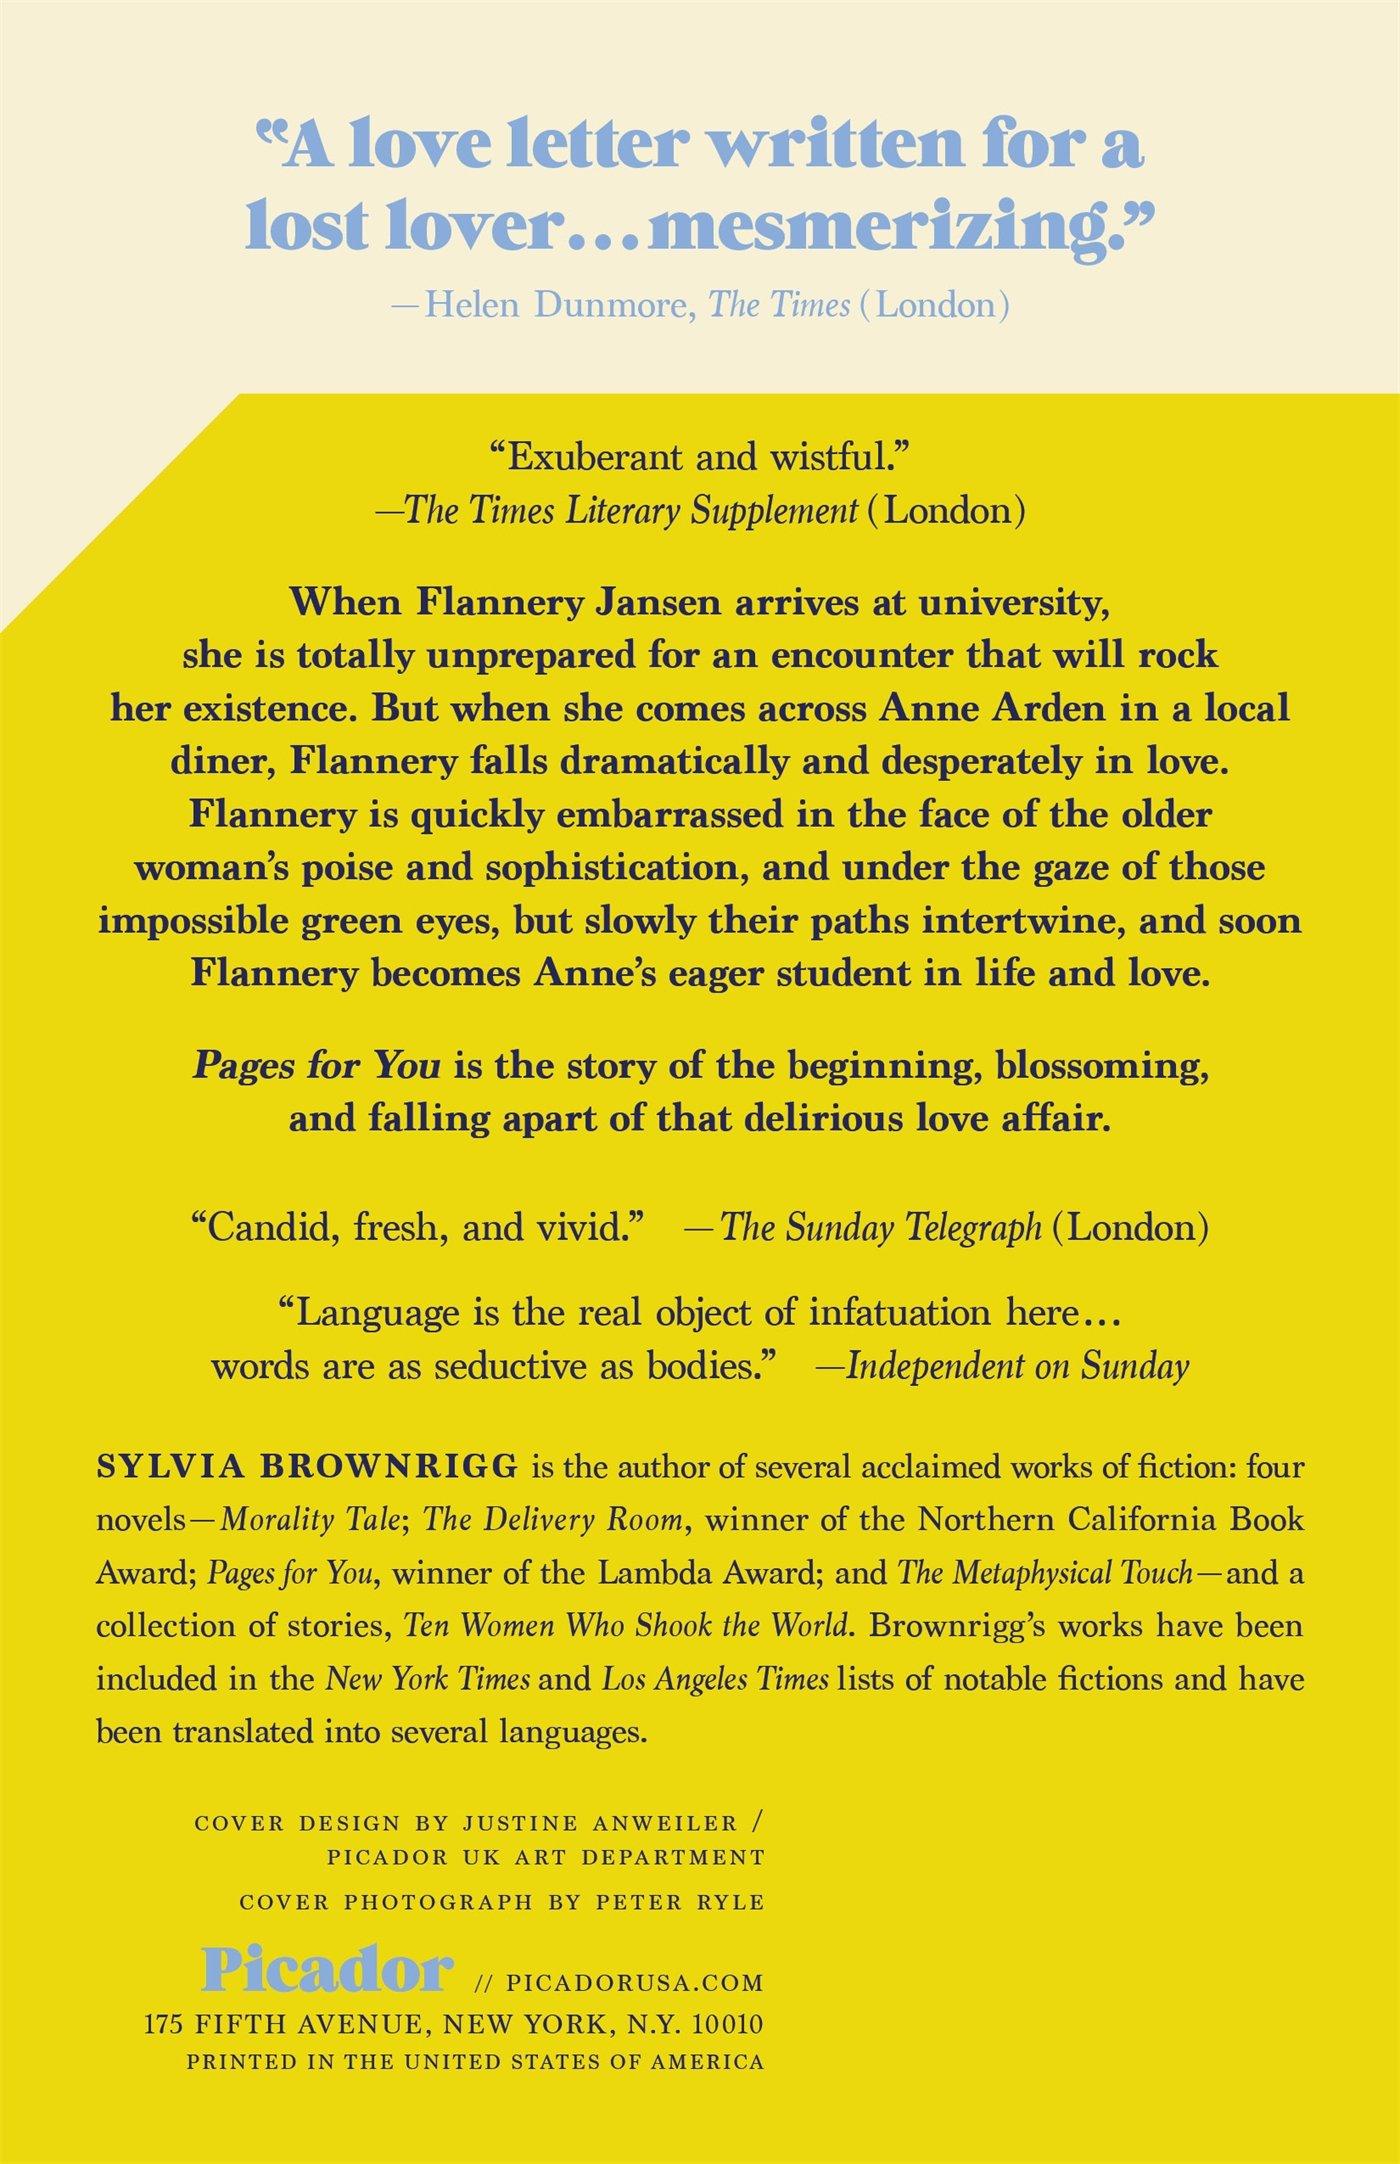 pages for you brownrigg sylvia